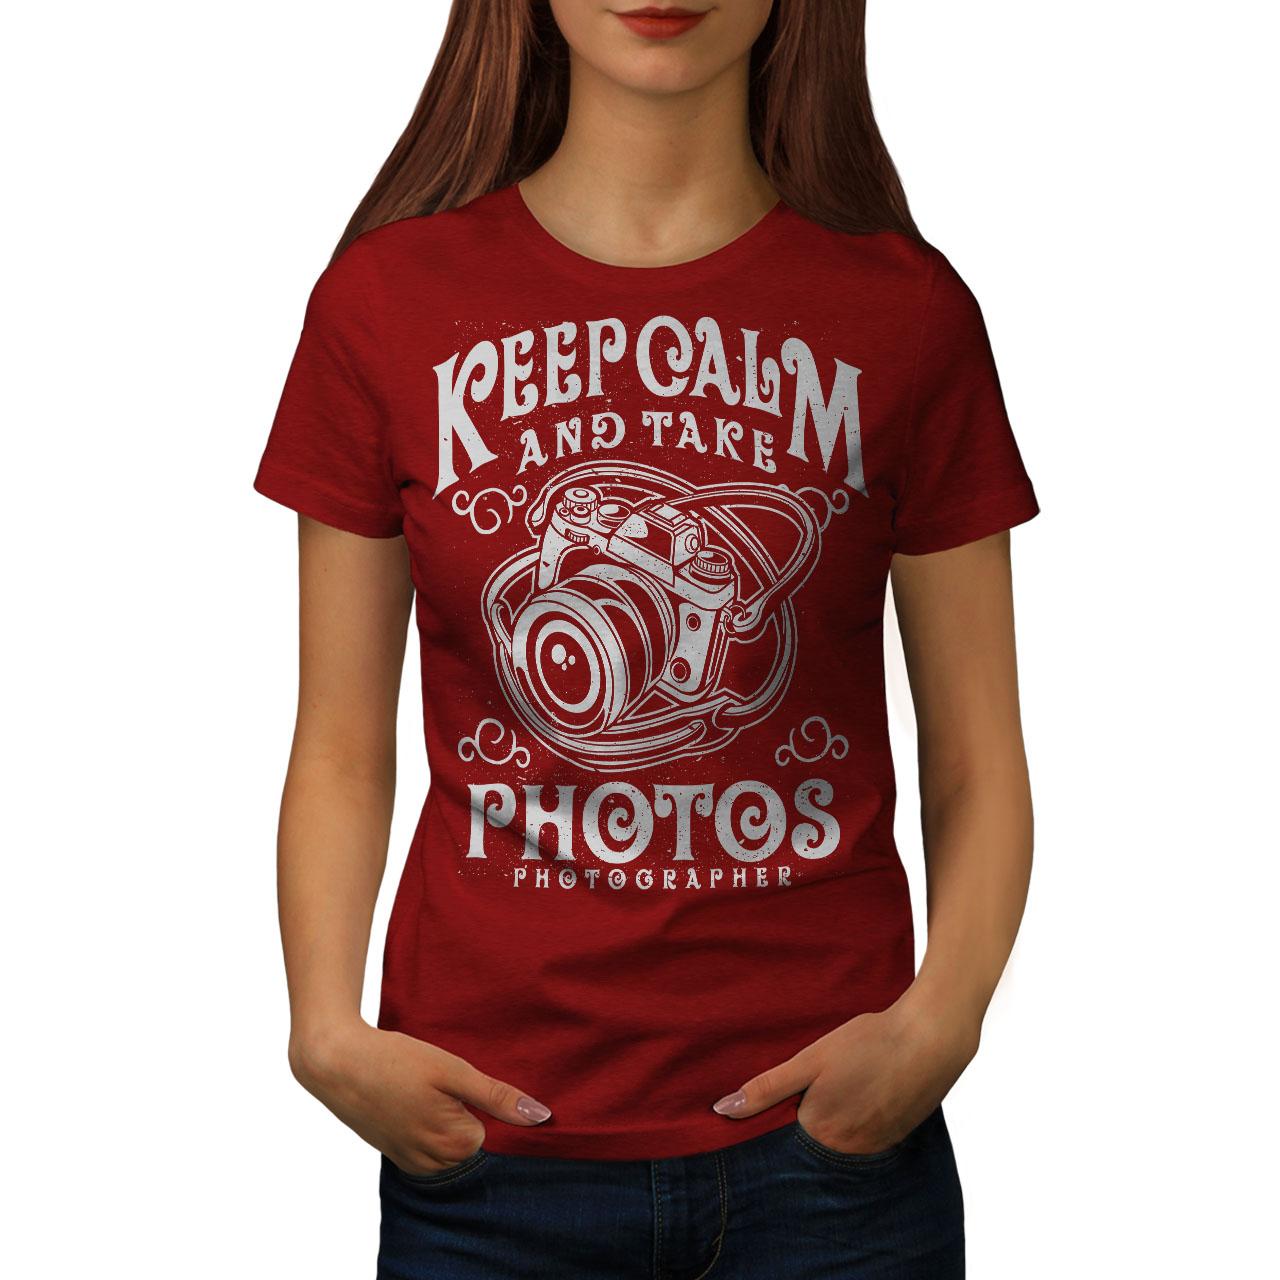 Calm-Photographer-Fashion-Women-T-shirt-NEW-Wellcoda miniatuur 9